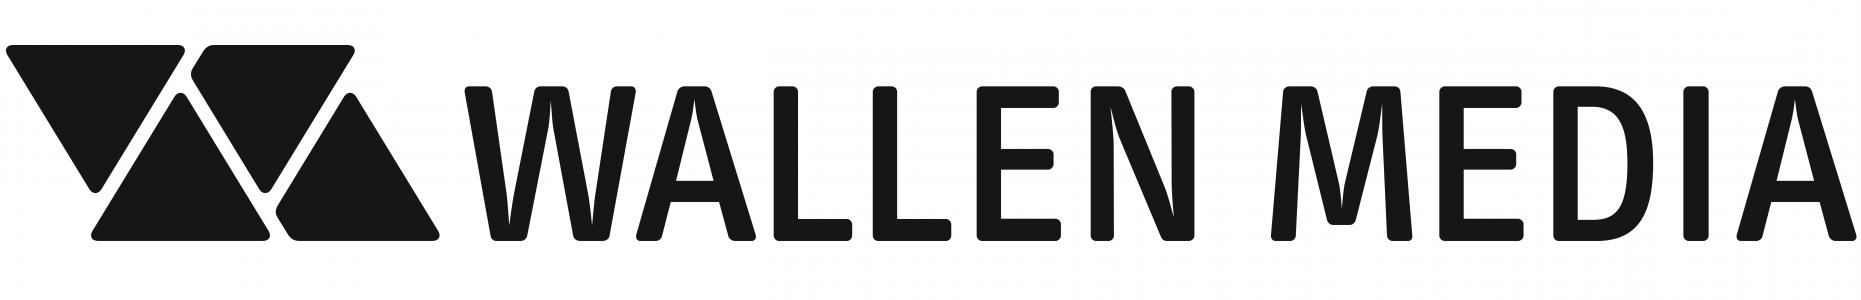 Wallen Media AB